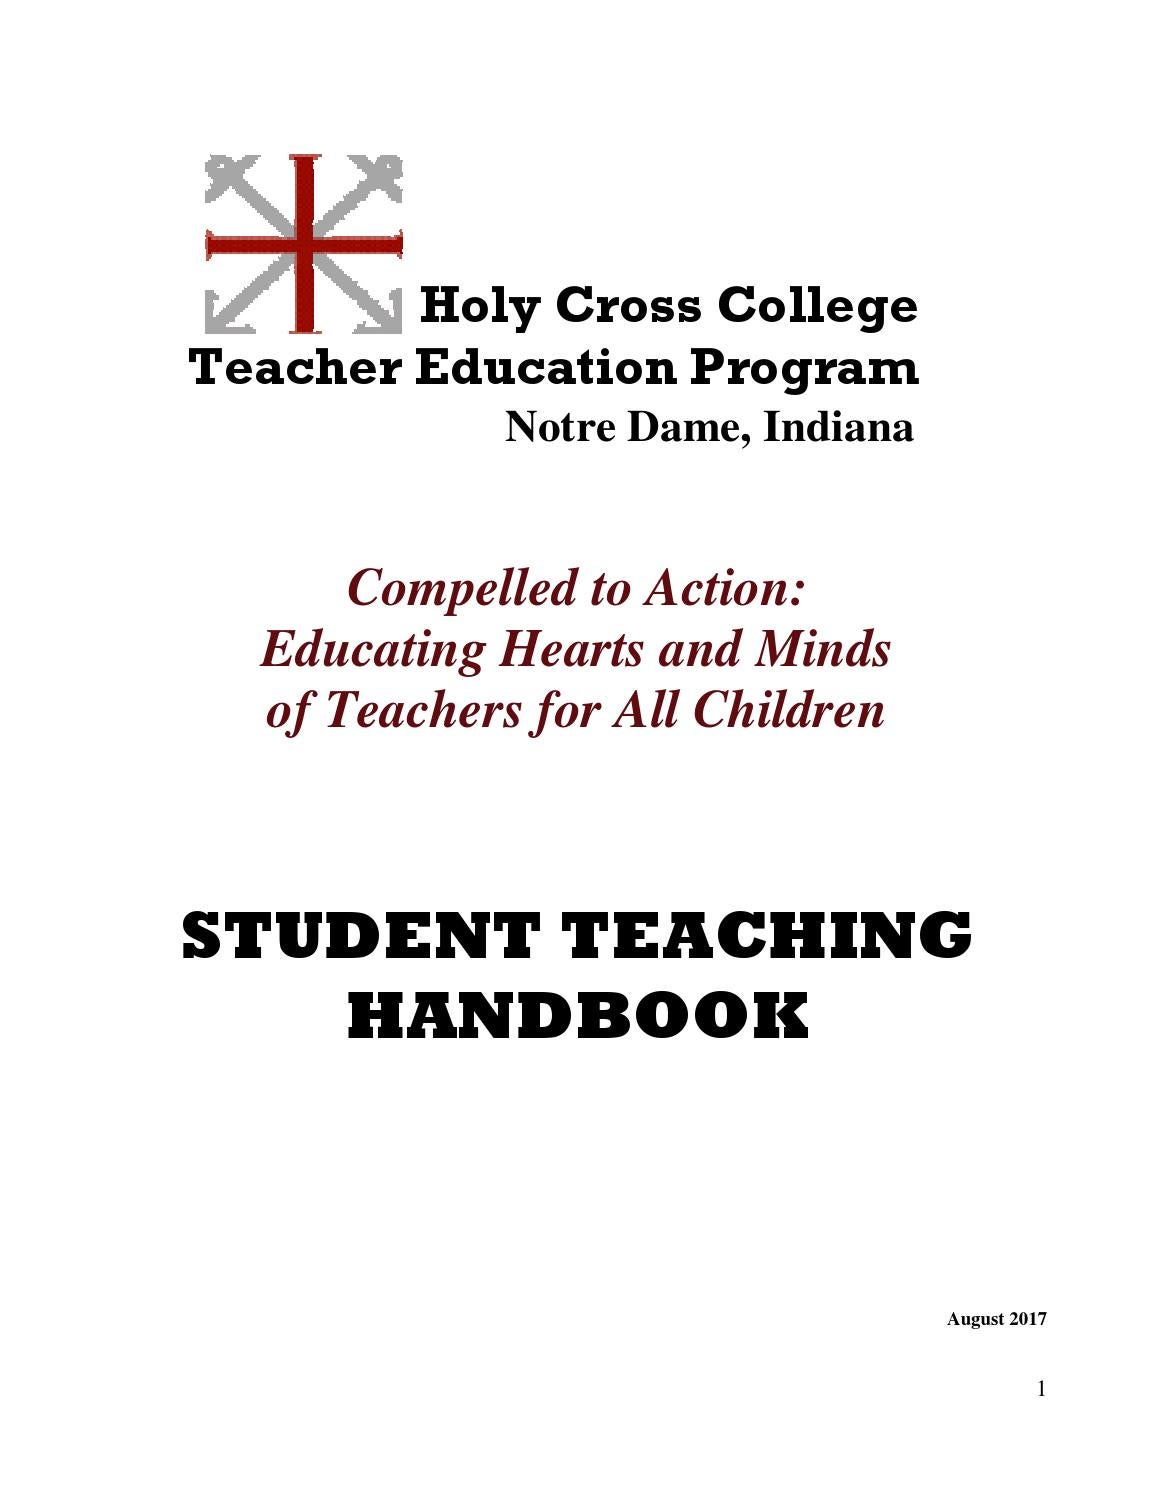 Student Teaching Handbook by Holy Cross College - issuu